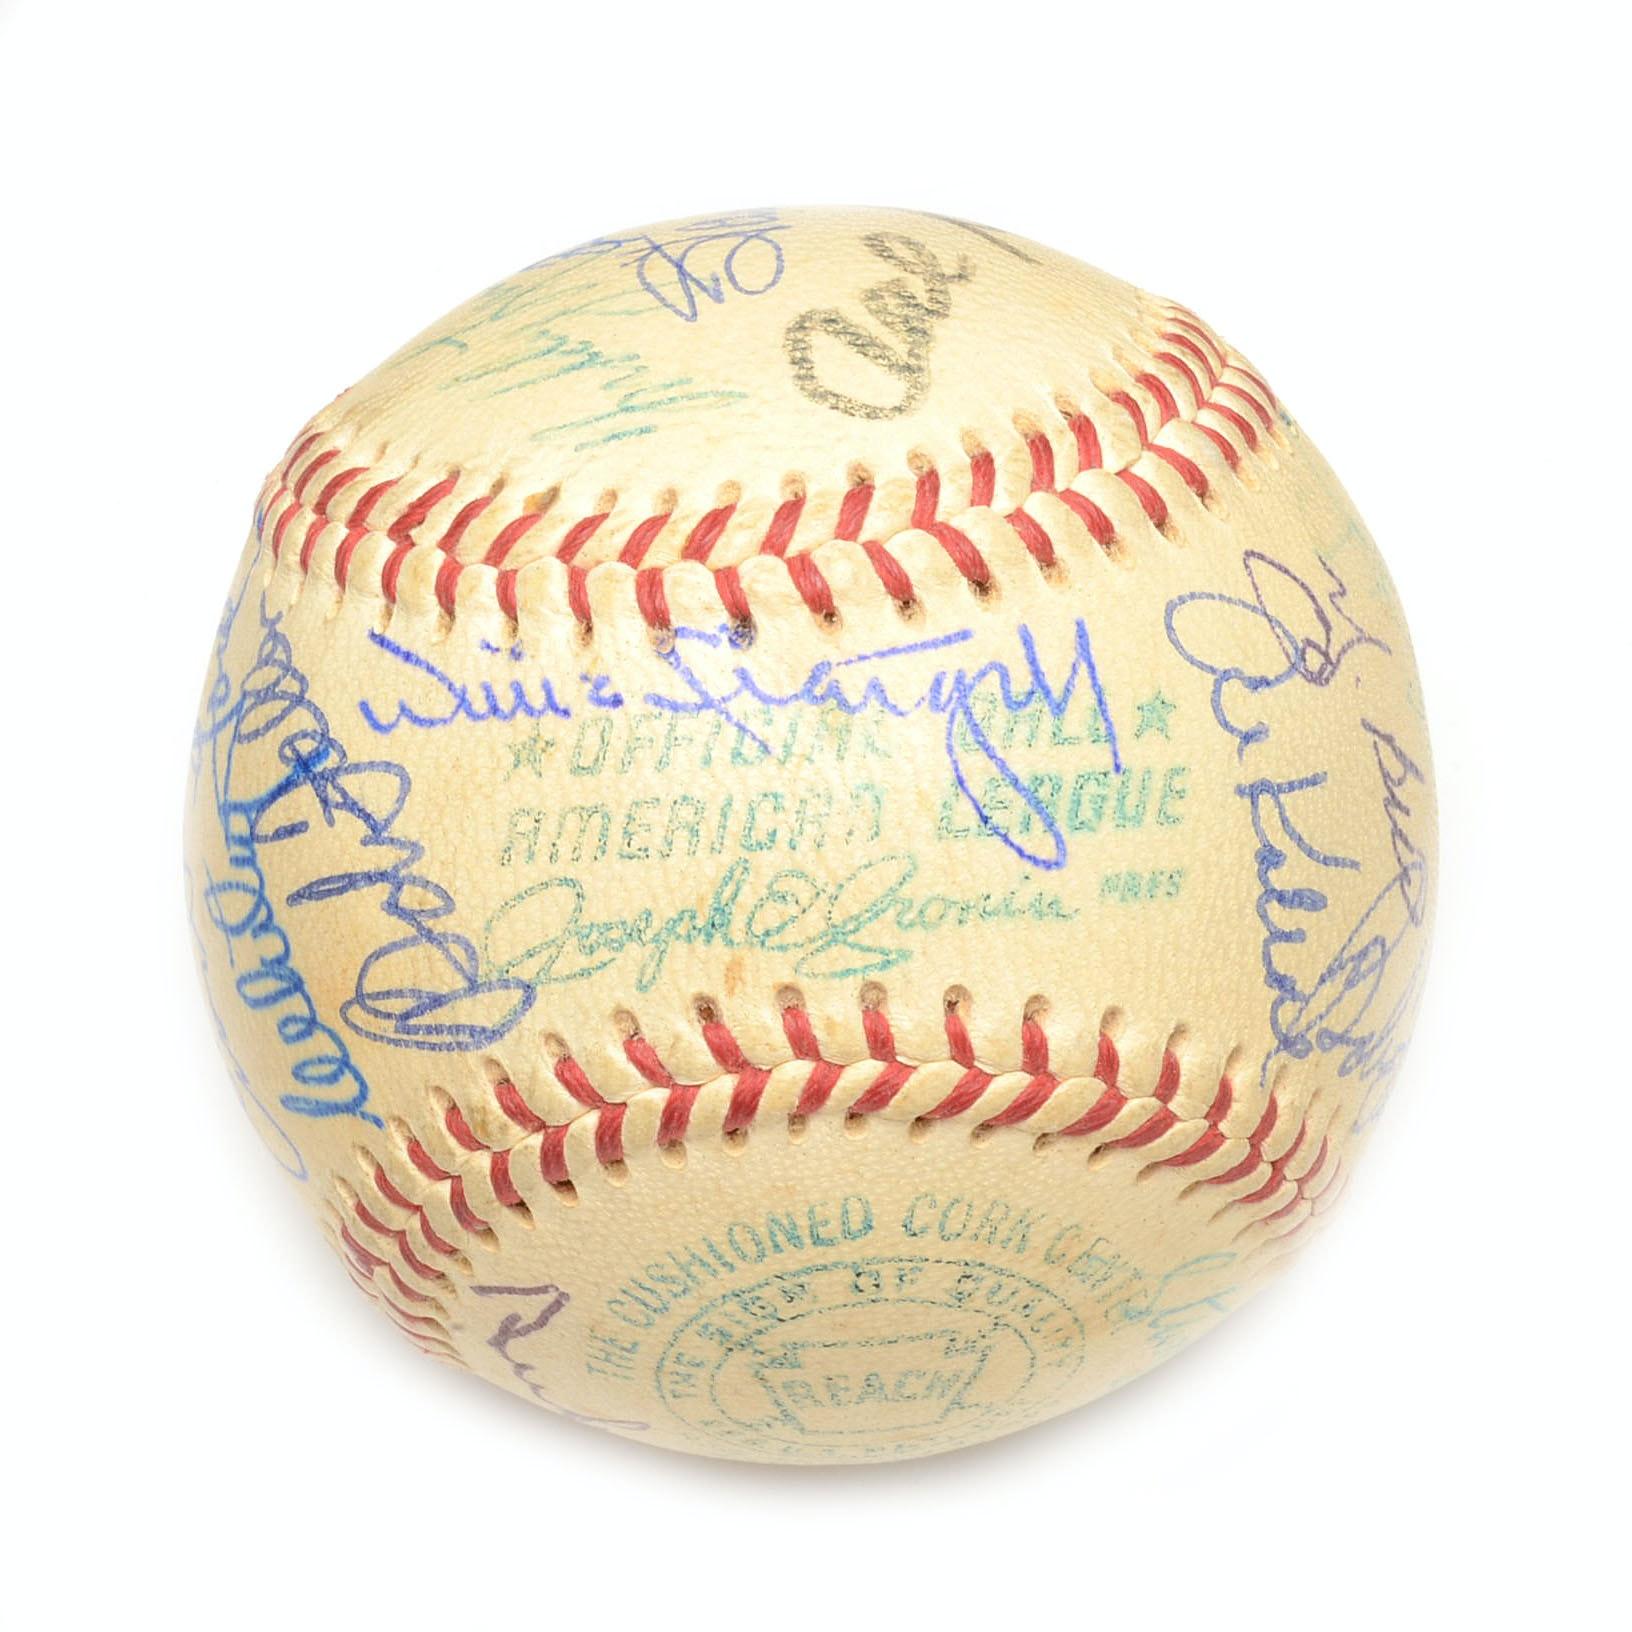 Hall Of Fame Signed Baseball Coa Ebth